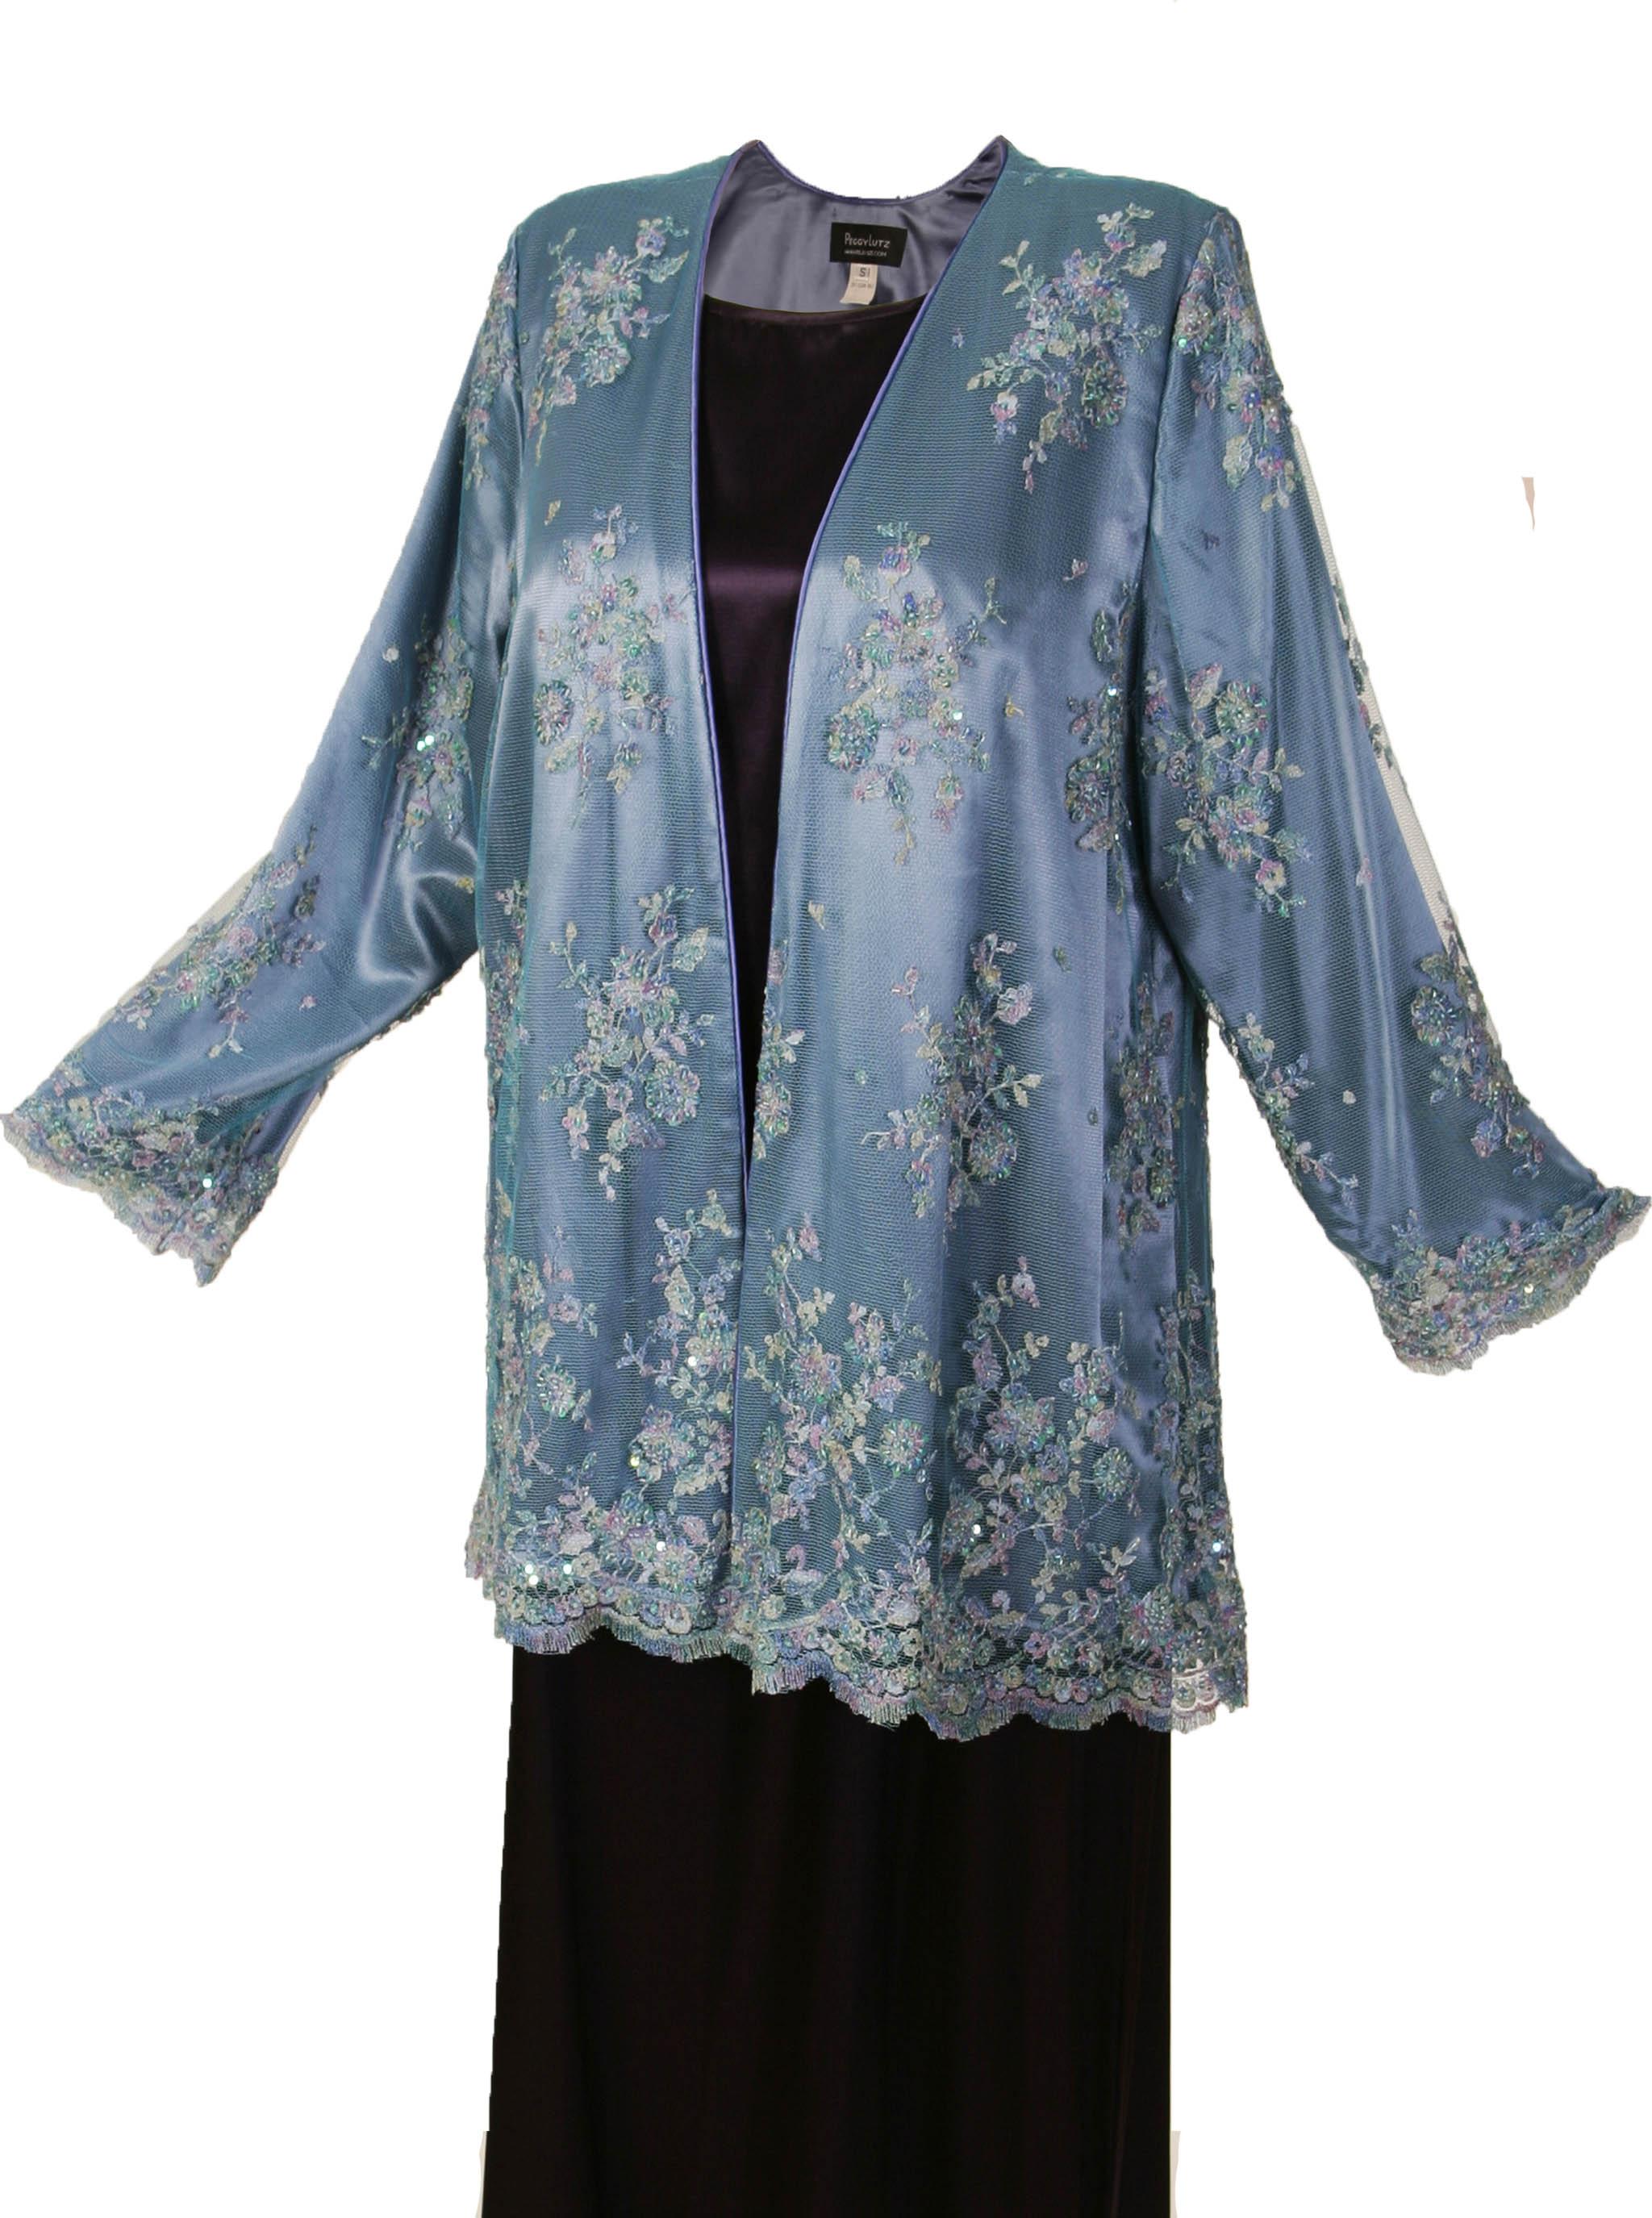 Plus Size Mother of Bride Gabi Jacket Beaded French Lace